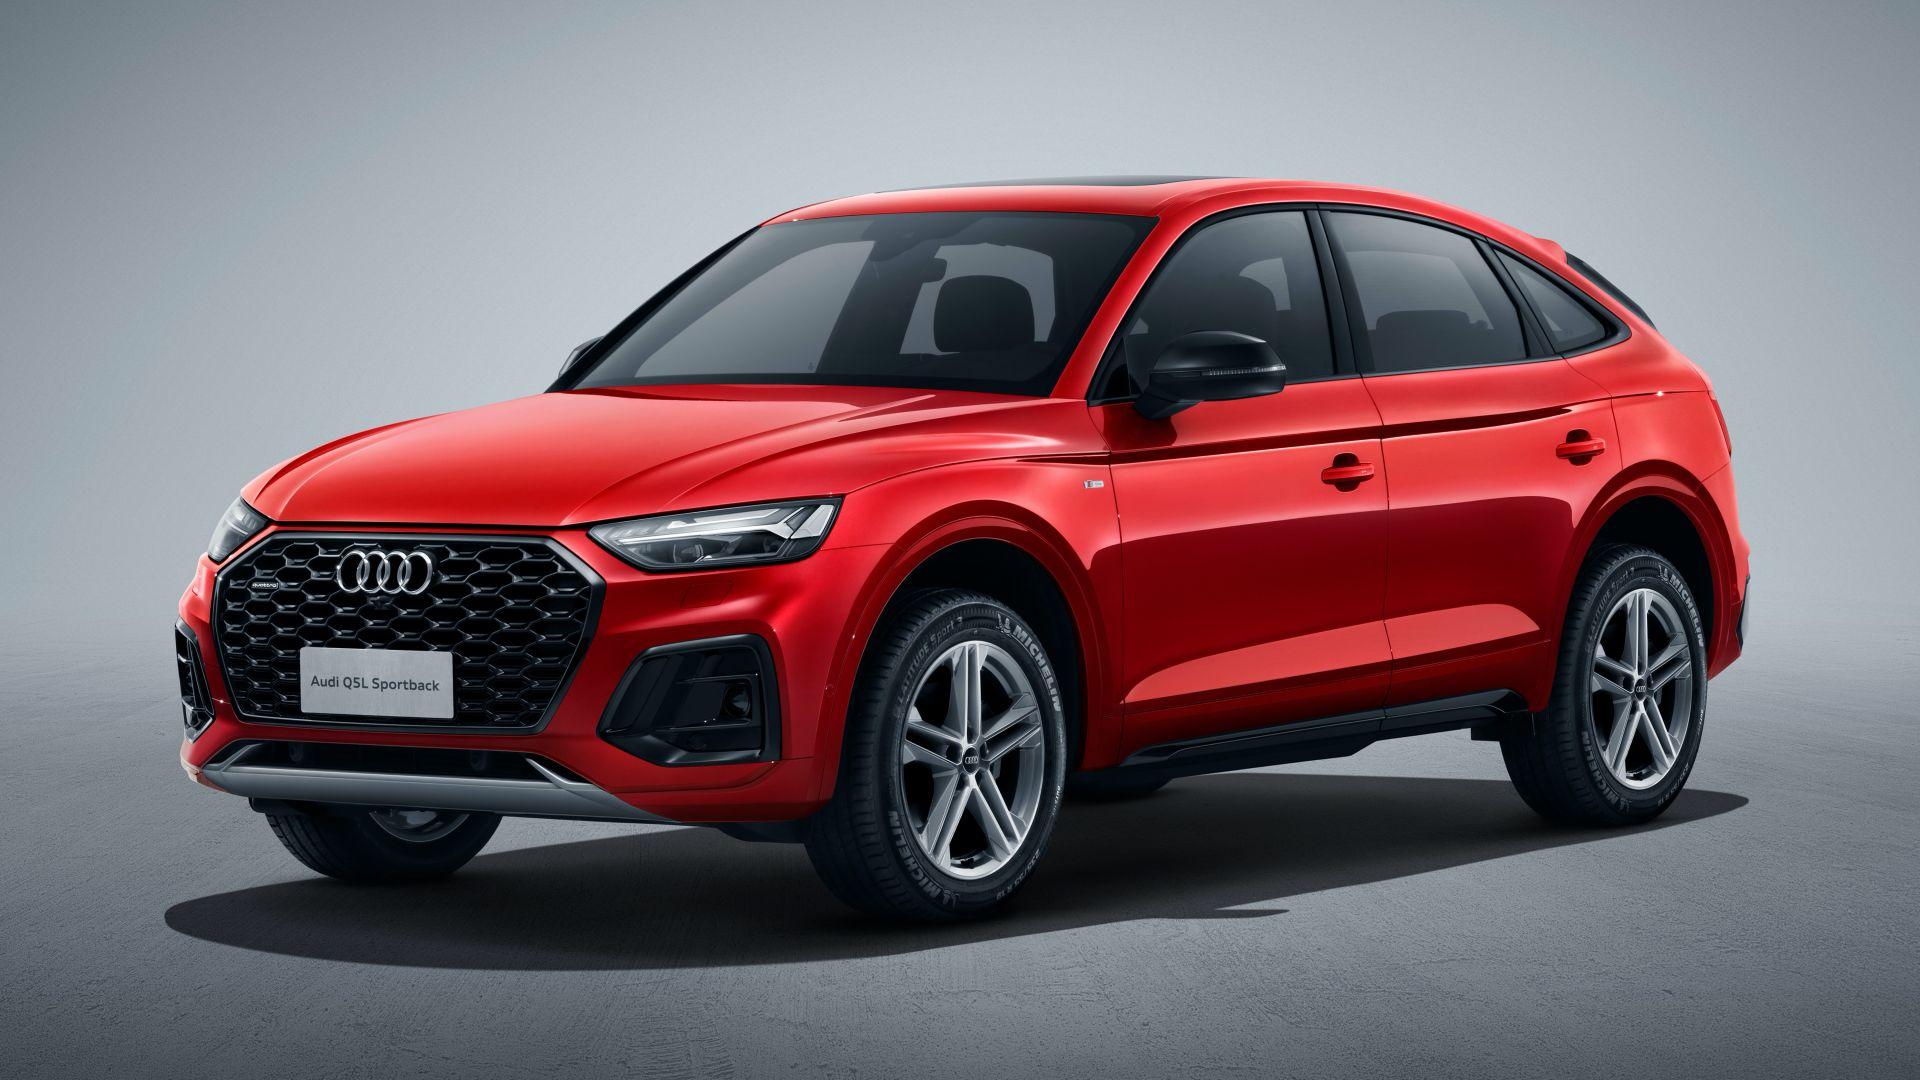 Audi-Q5L-Sportback-L-1